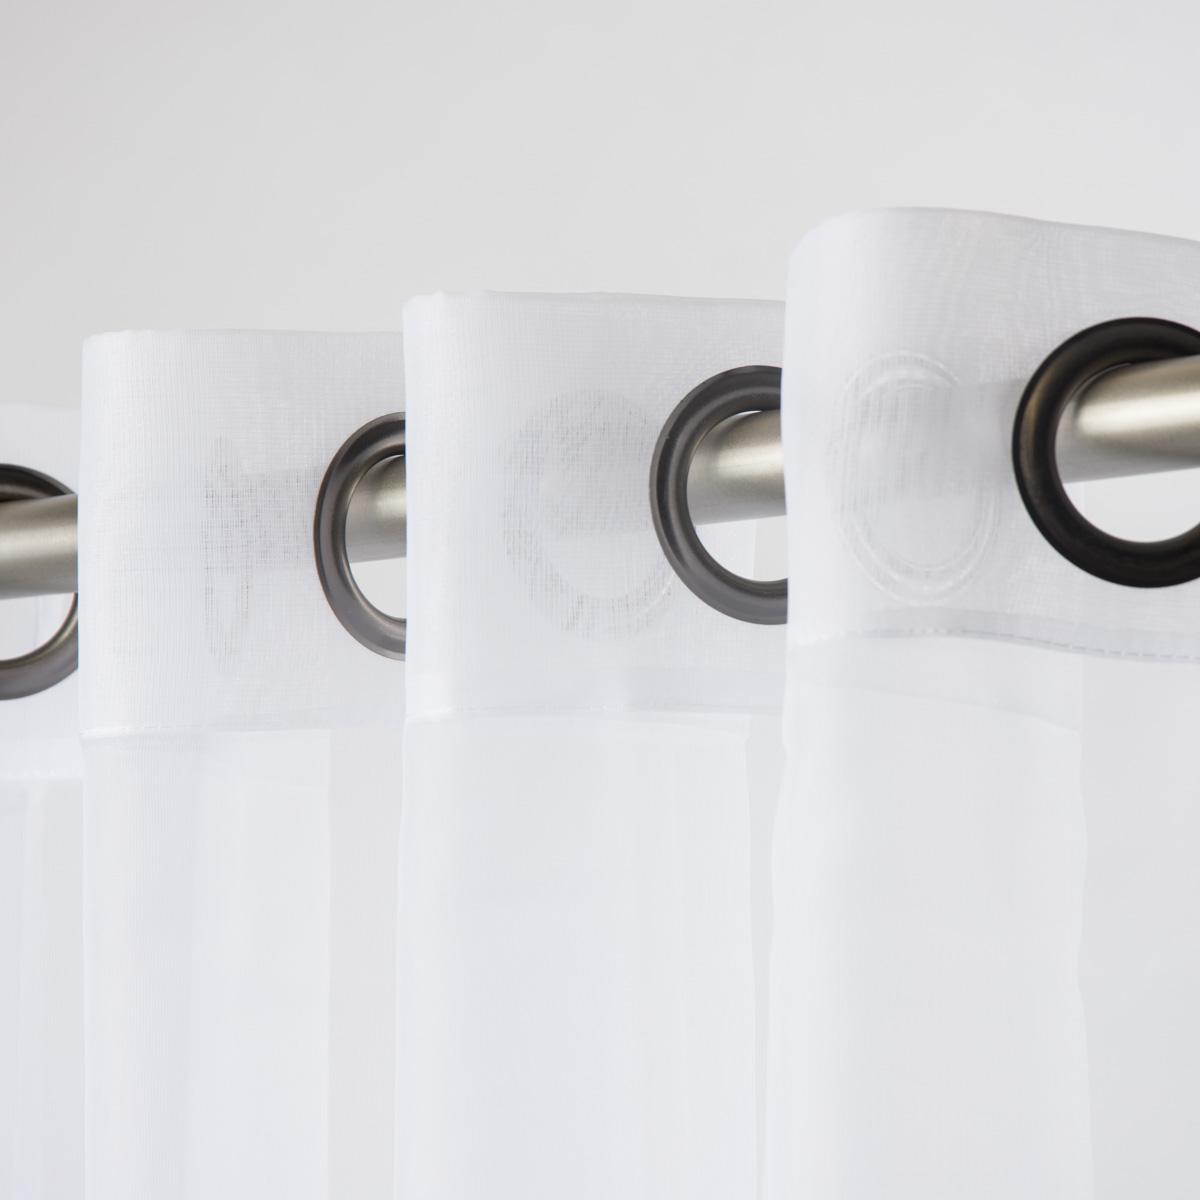 fertiggardine sengardine einfarbig voile creme 135x260cm fertiggardinen senschals. Black Bedroom Furniture Sets. Home Design Ideas